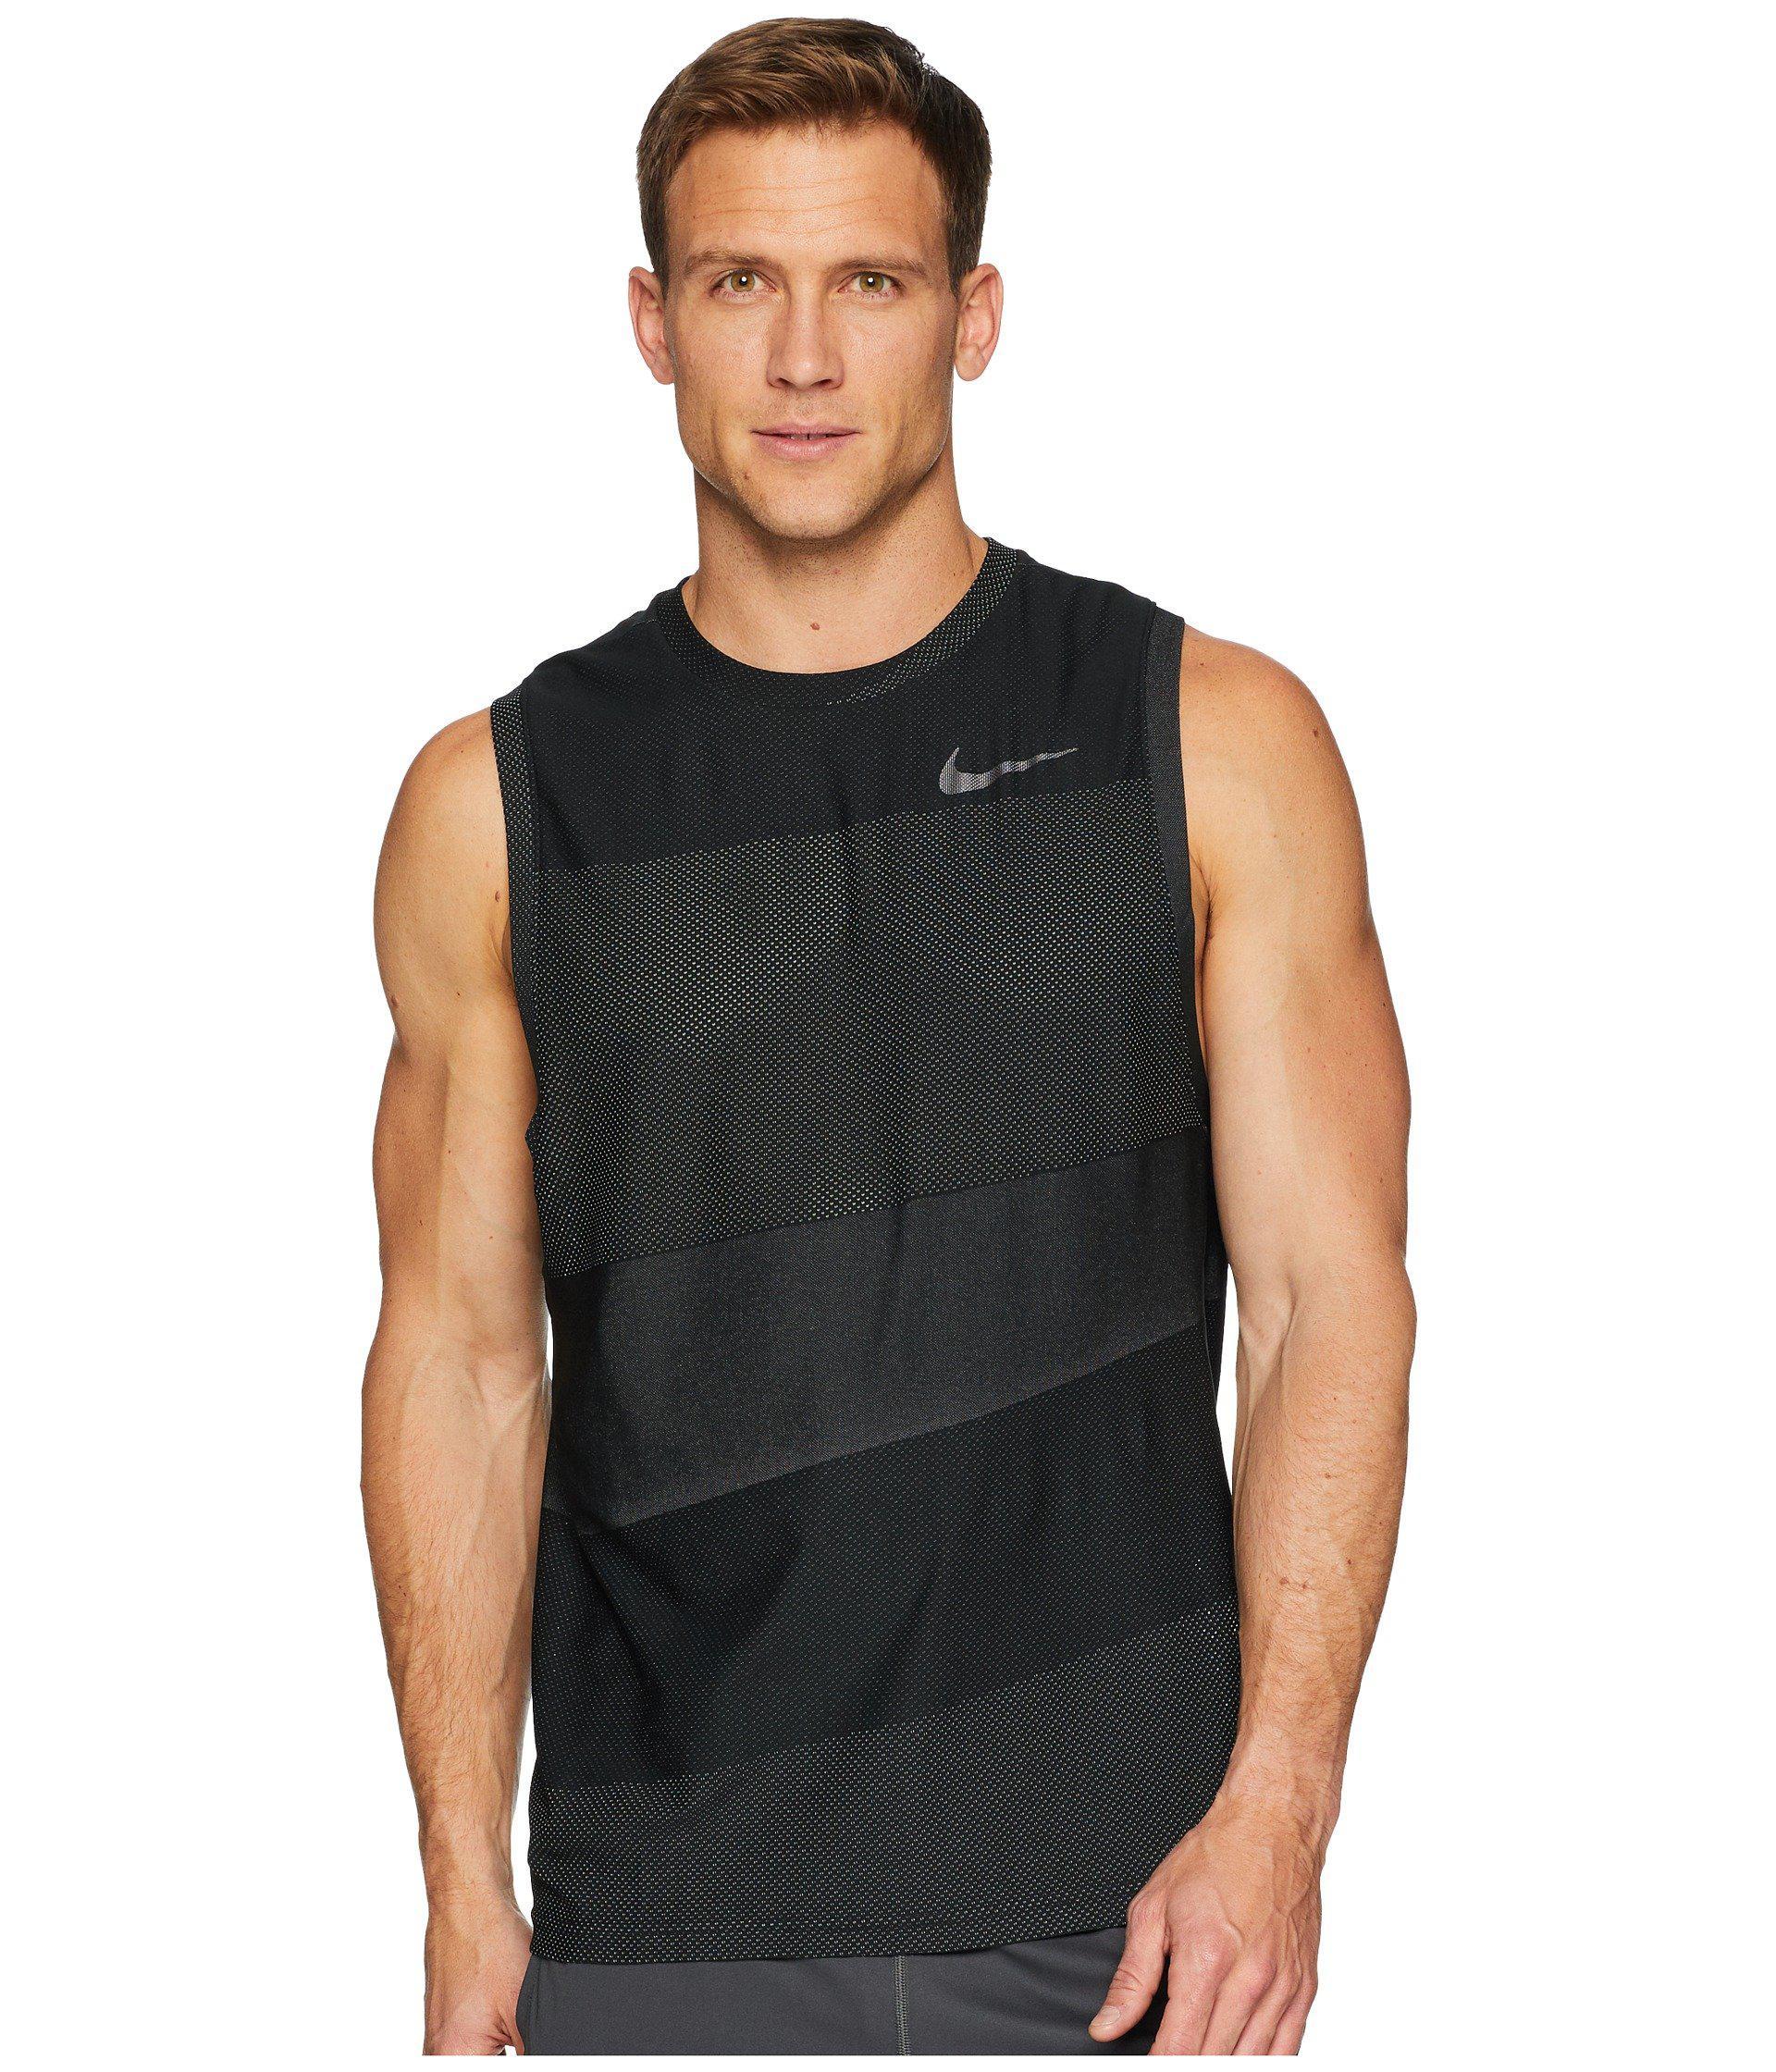 d141a20ceb767 Lyst - Nike Breathe Tank Top Hyper Vent in Black for Men